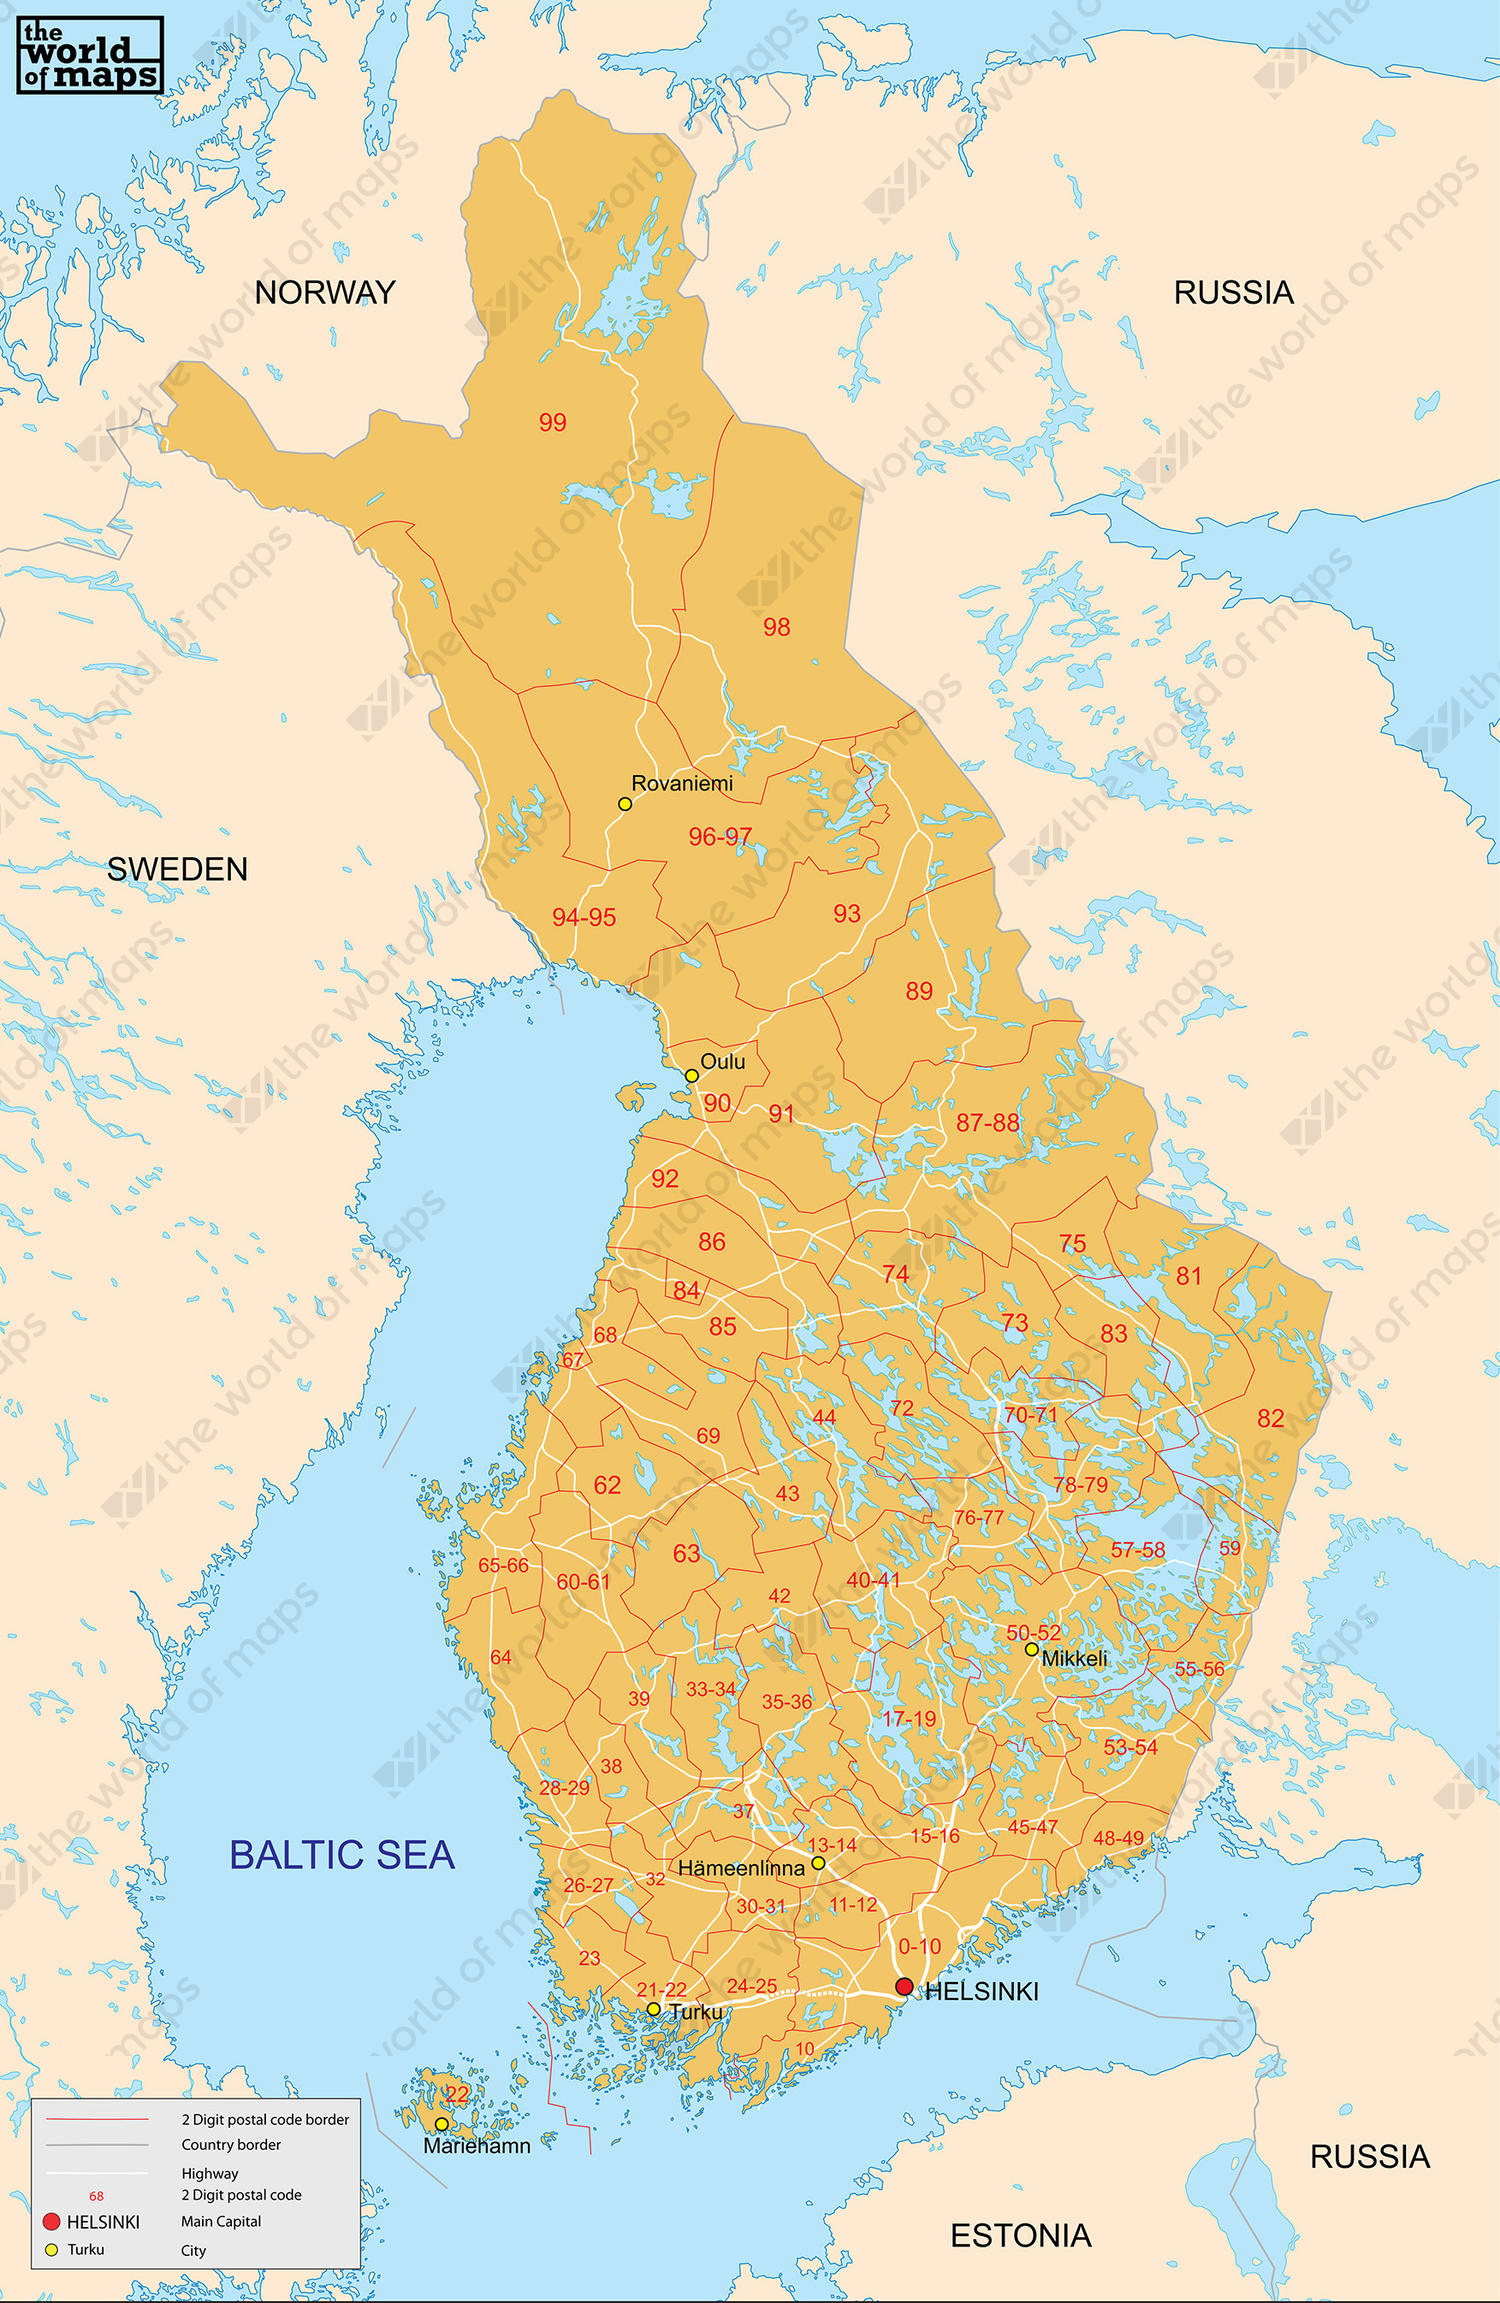 Digital postcode map finland 2 digit 79 the world of maps digital postcode map finland 2 digit gumiabroncs Images